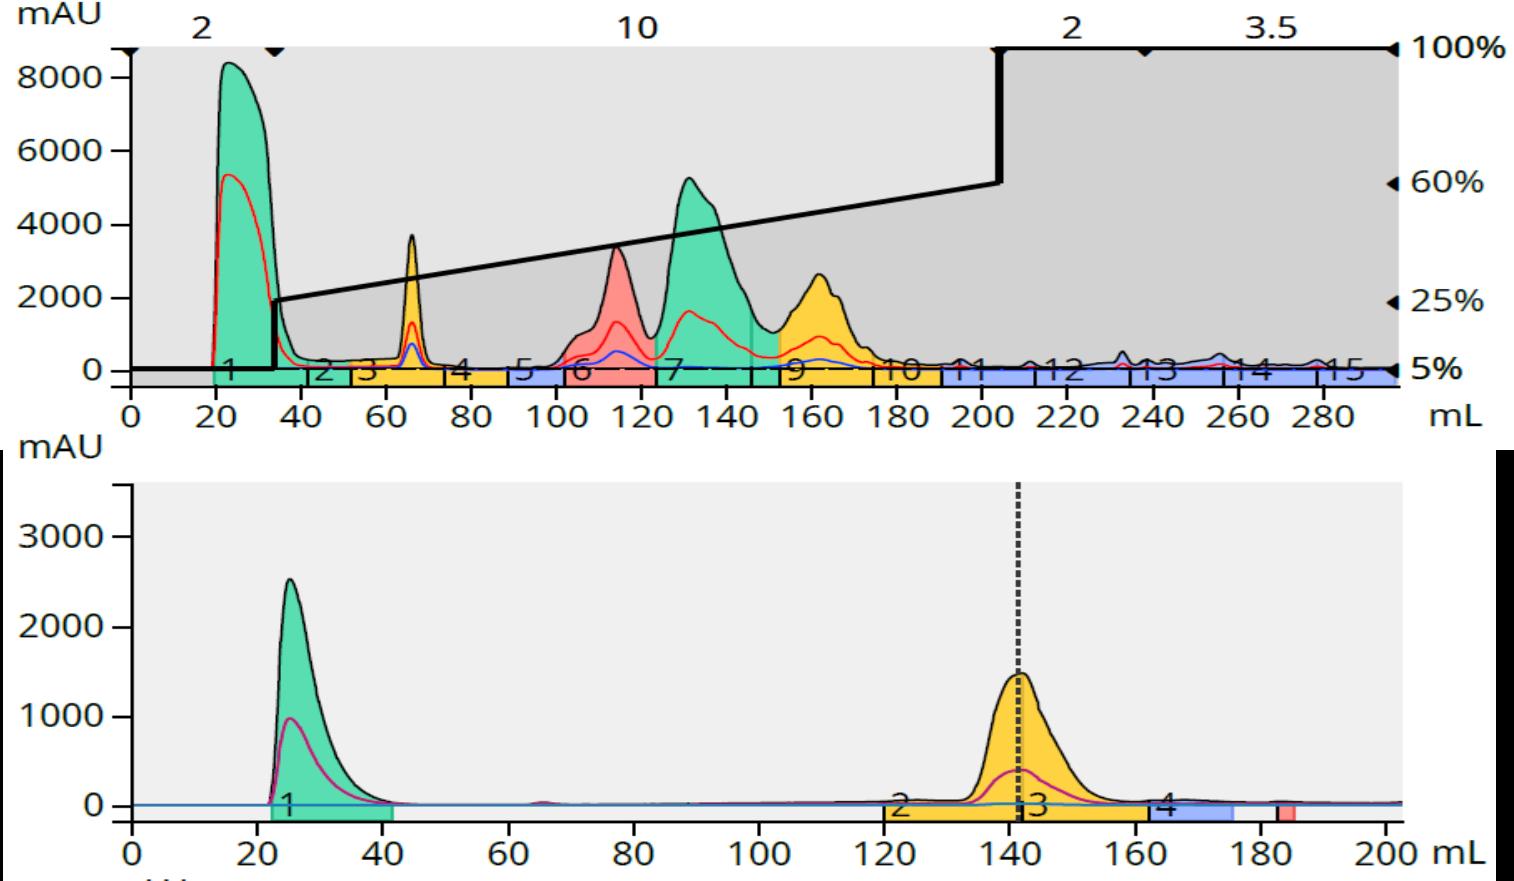 mba 139 mg load and f7 analysis